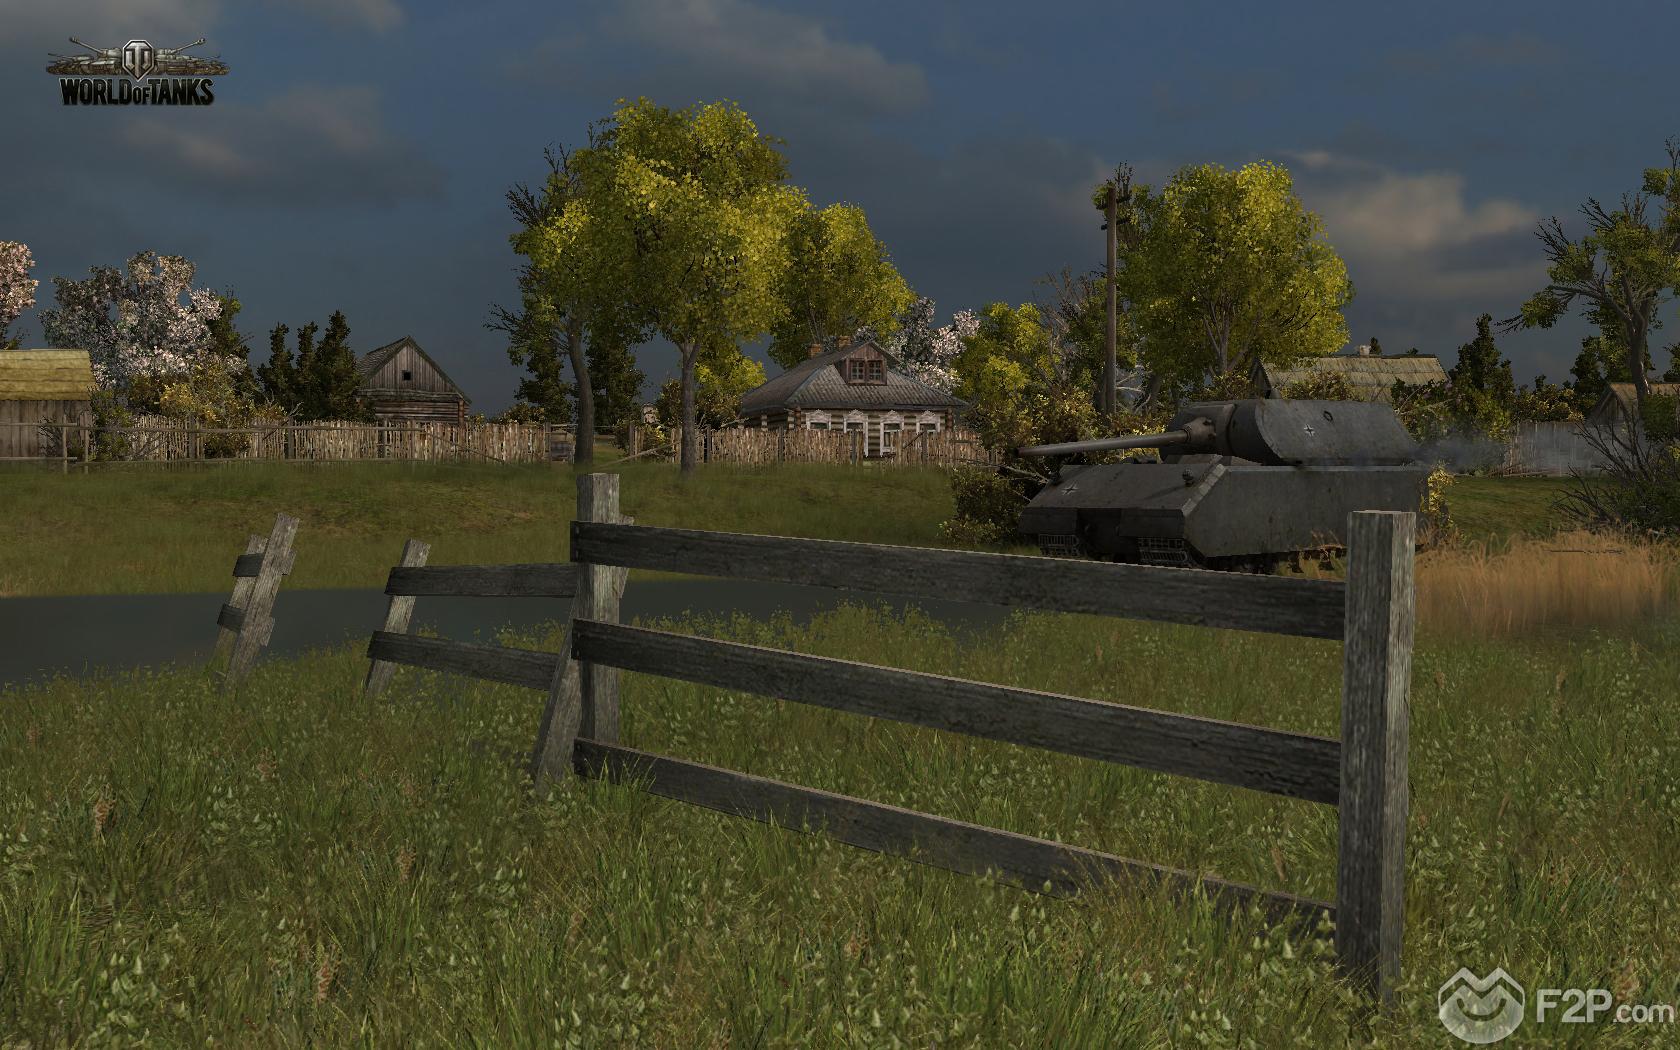 Click image for larger version.Name:World of Tanks 68.jpgViews:224Size:1.46 MBID:3991